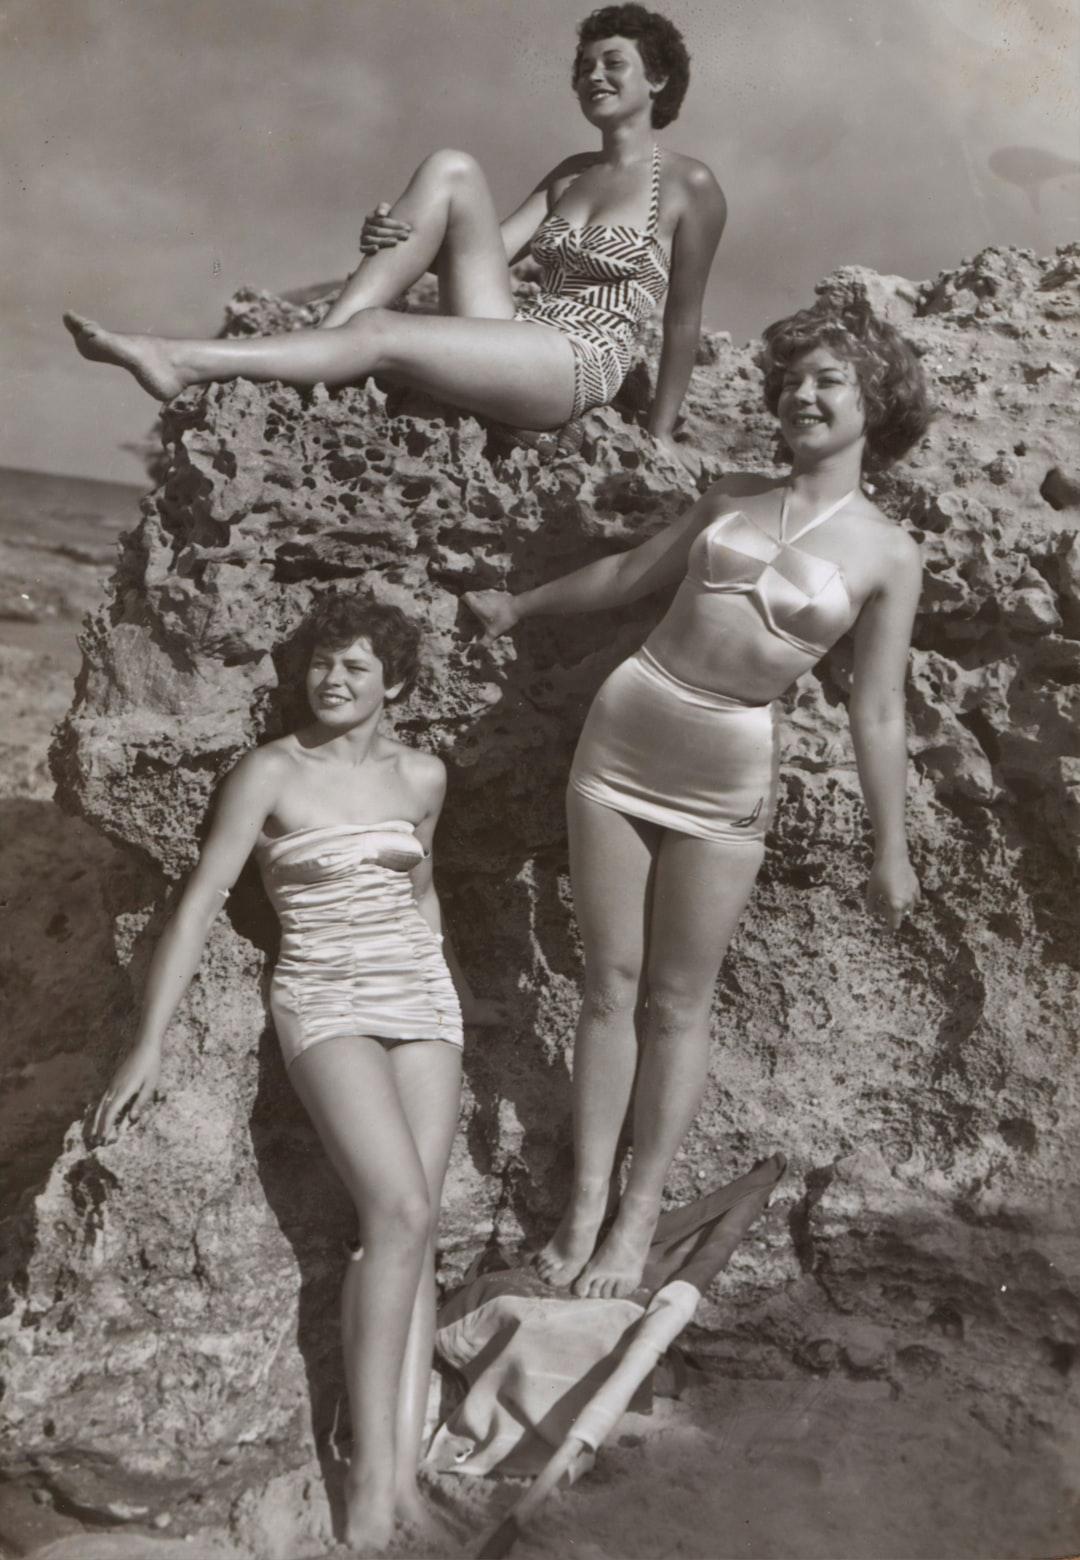 Bernice Kopple, Photograph used in article 'Bonny Scot Beach Girl', Australia,1950s